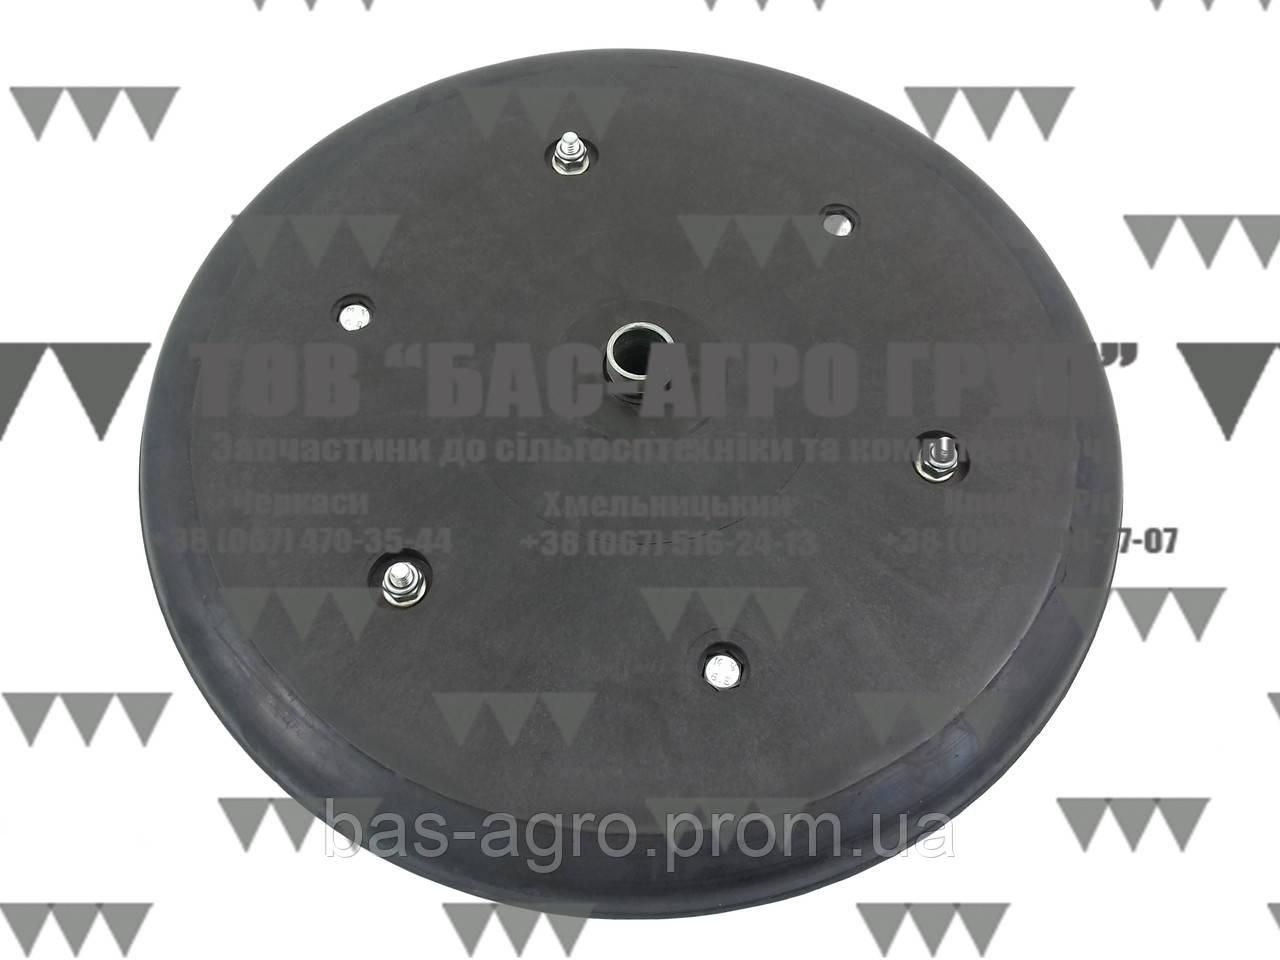 Колесо прикатывающее 300х25L Gaspardo F06120076 аналог